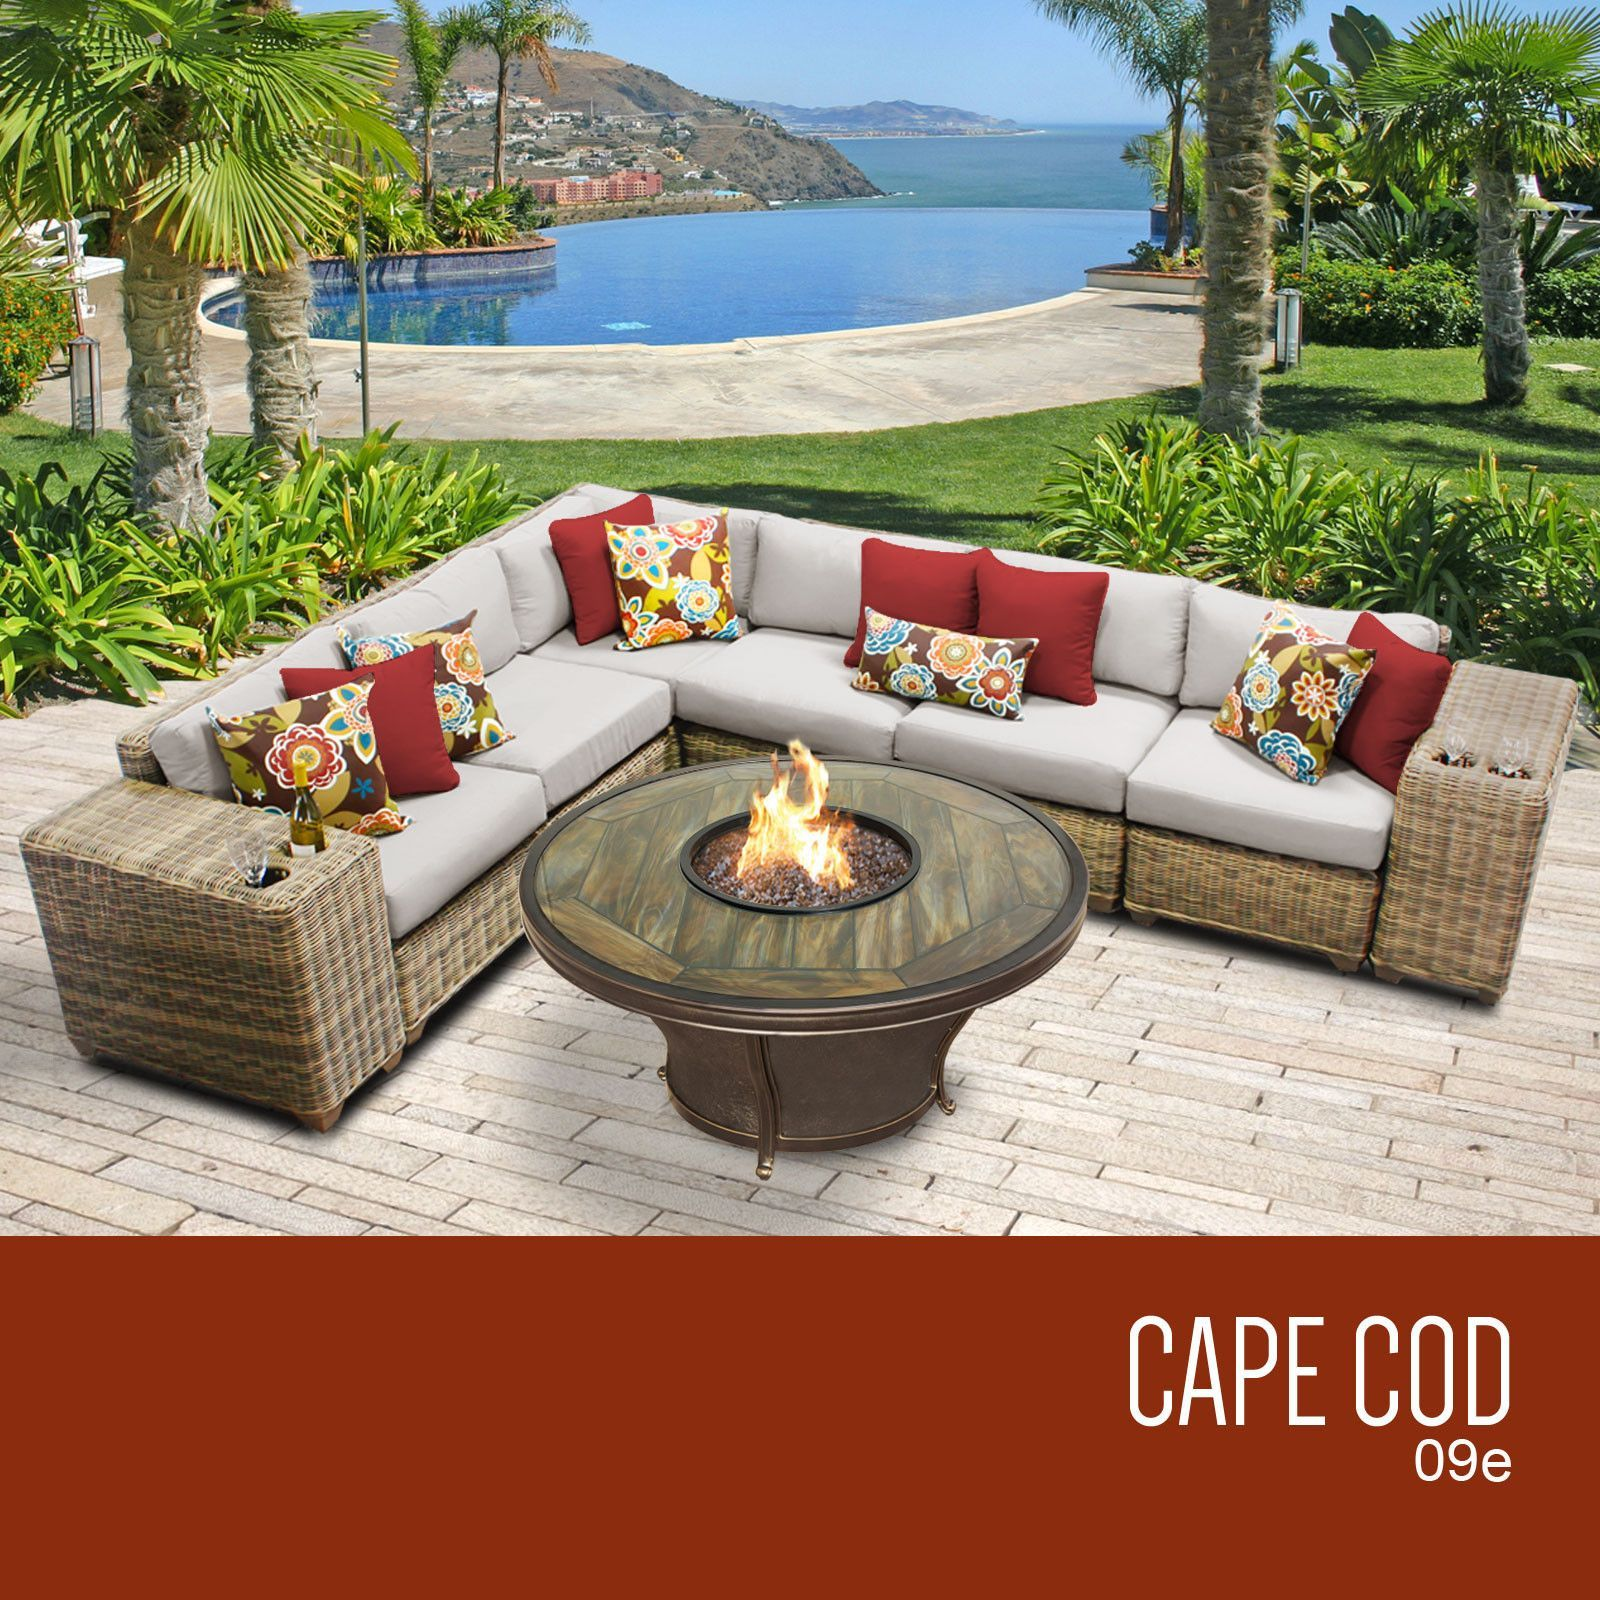 Cape Cod 9 Piece Outdoor Wicker Patio Furniture Set 09e